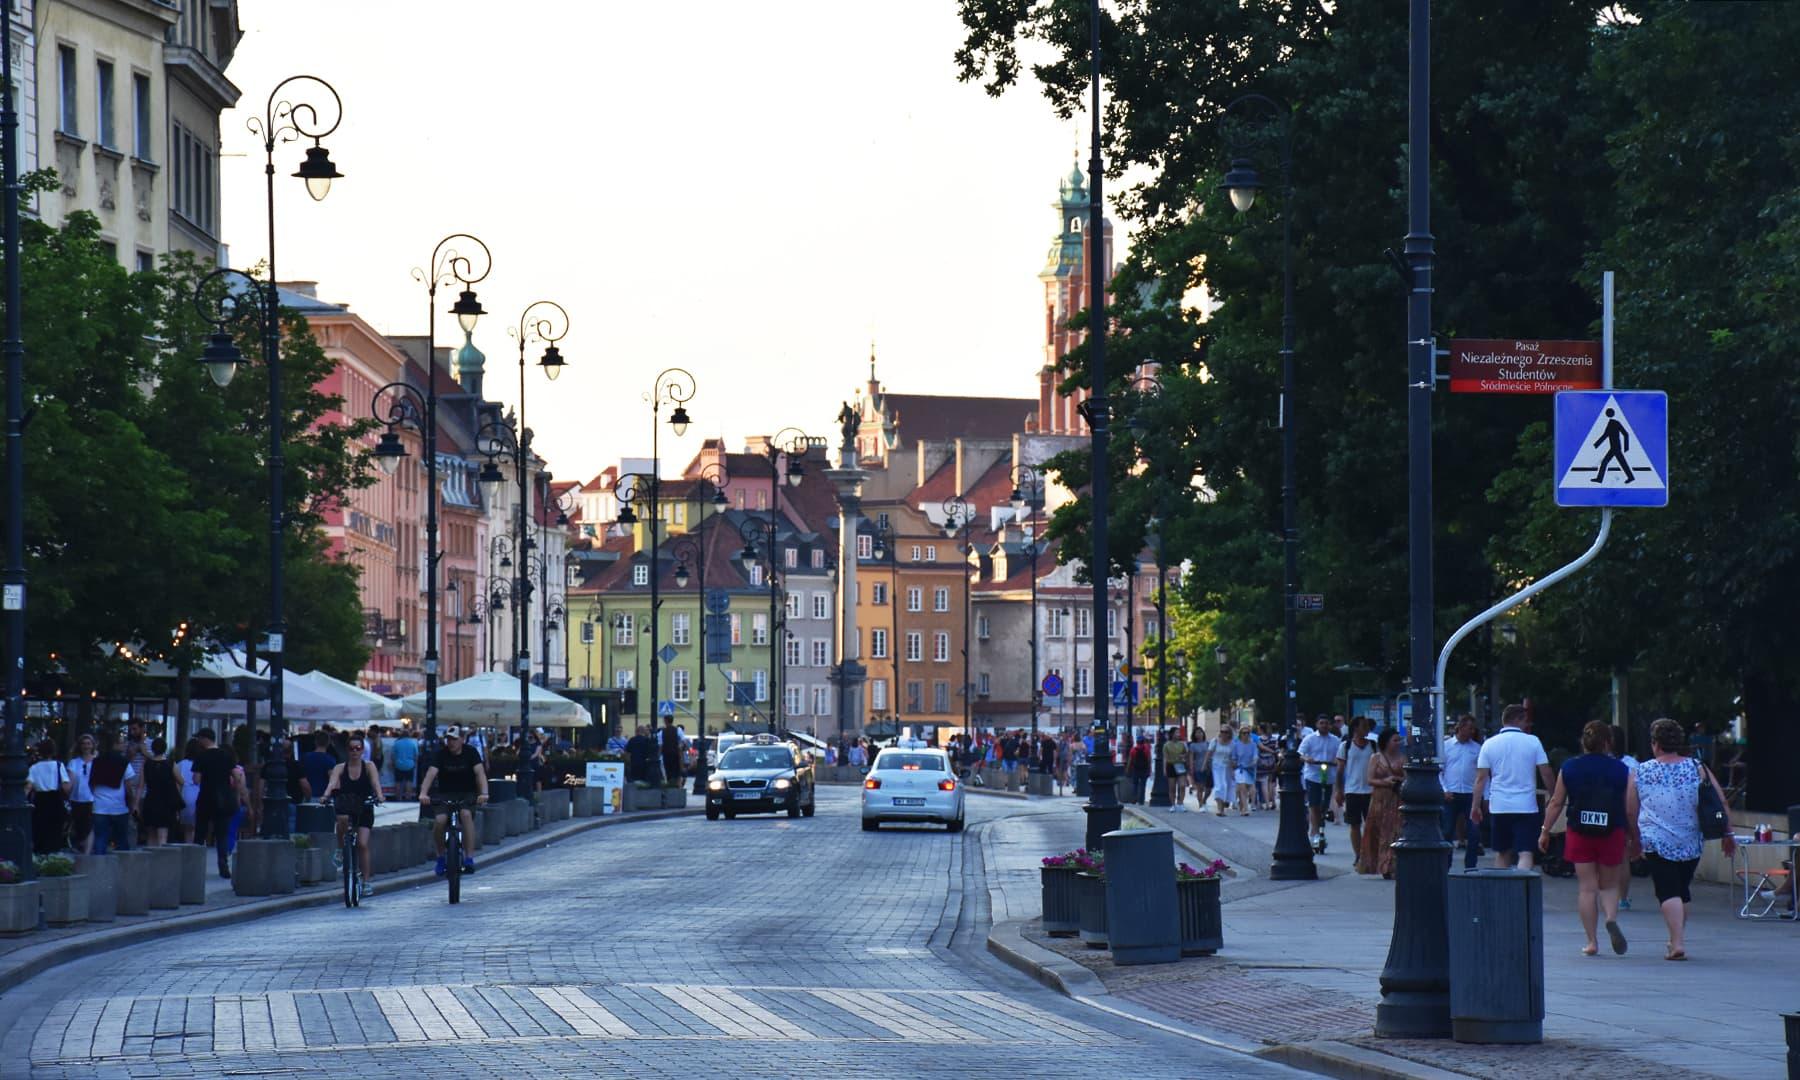 وارسا کی ایک شارع